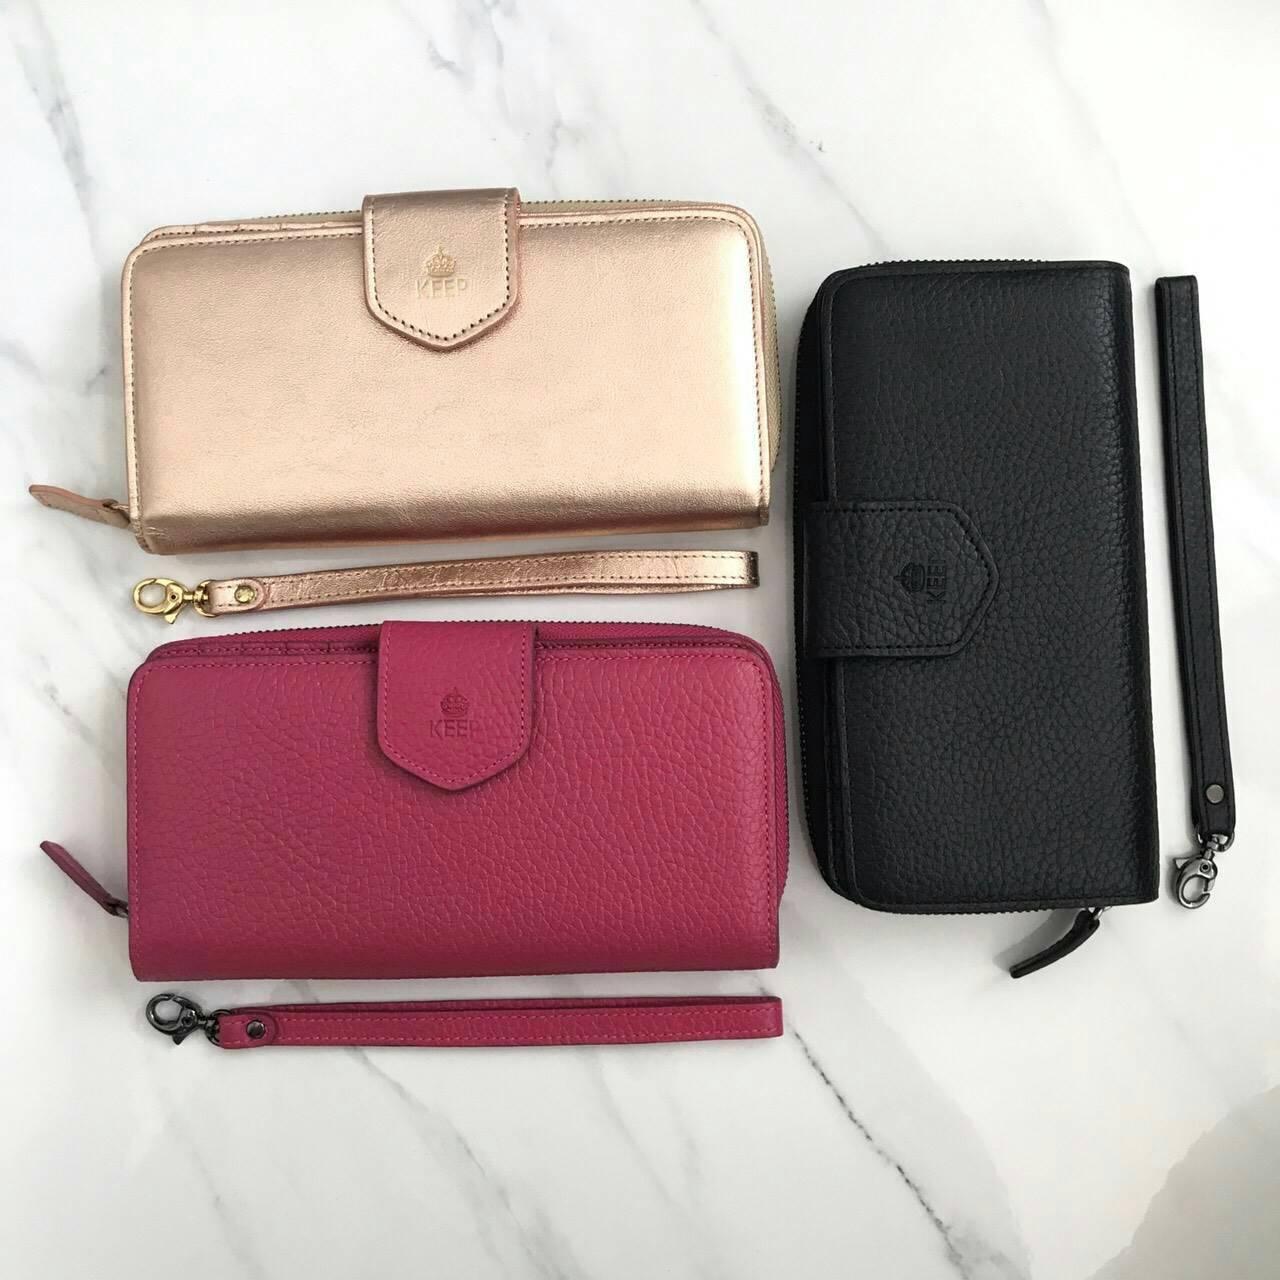 Keep Genuine Leather Clutch Wallet 2018 free Box